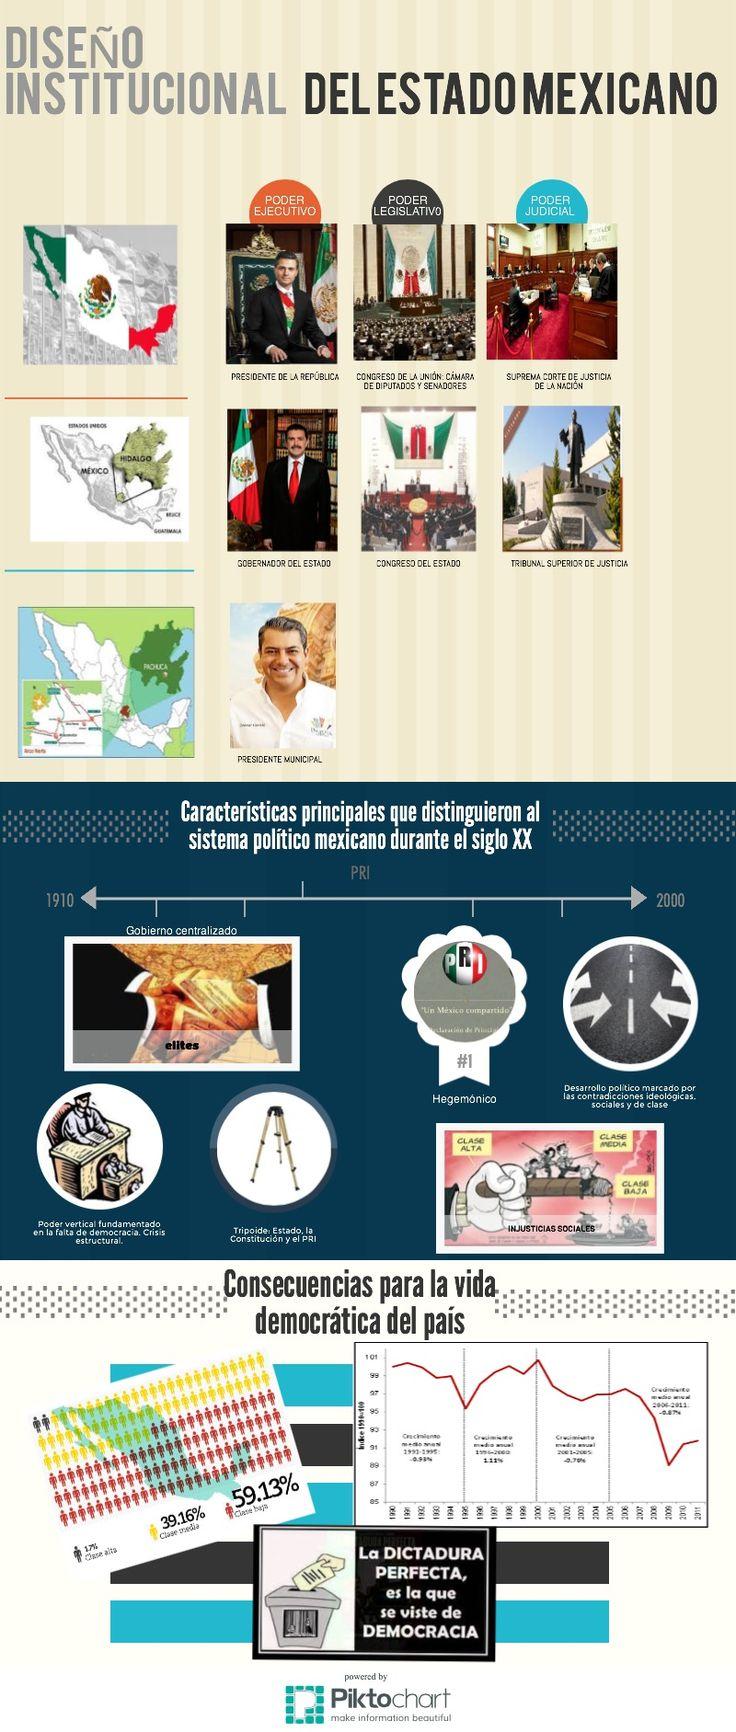 Sistema Político Mexicano | @Piktochart Infographic